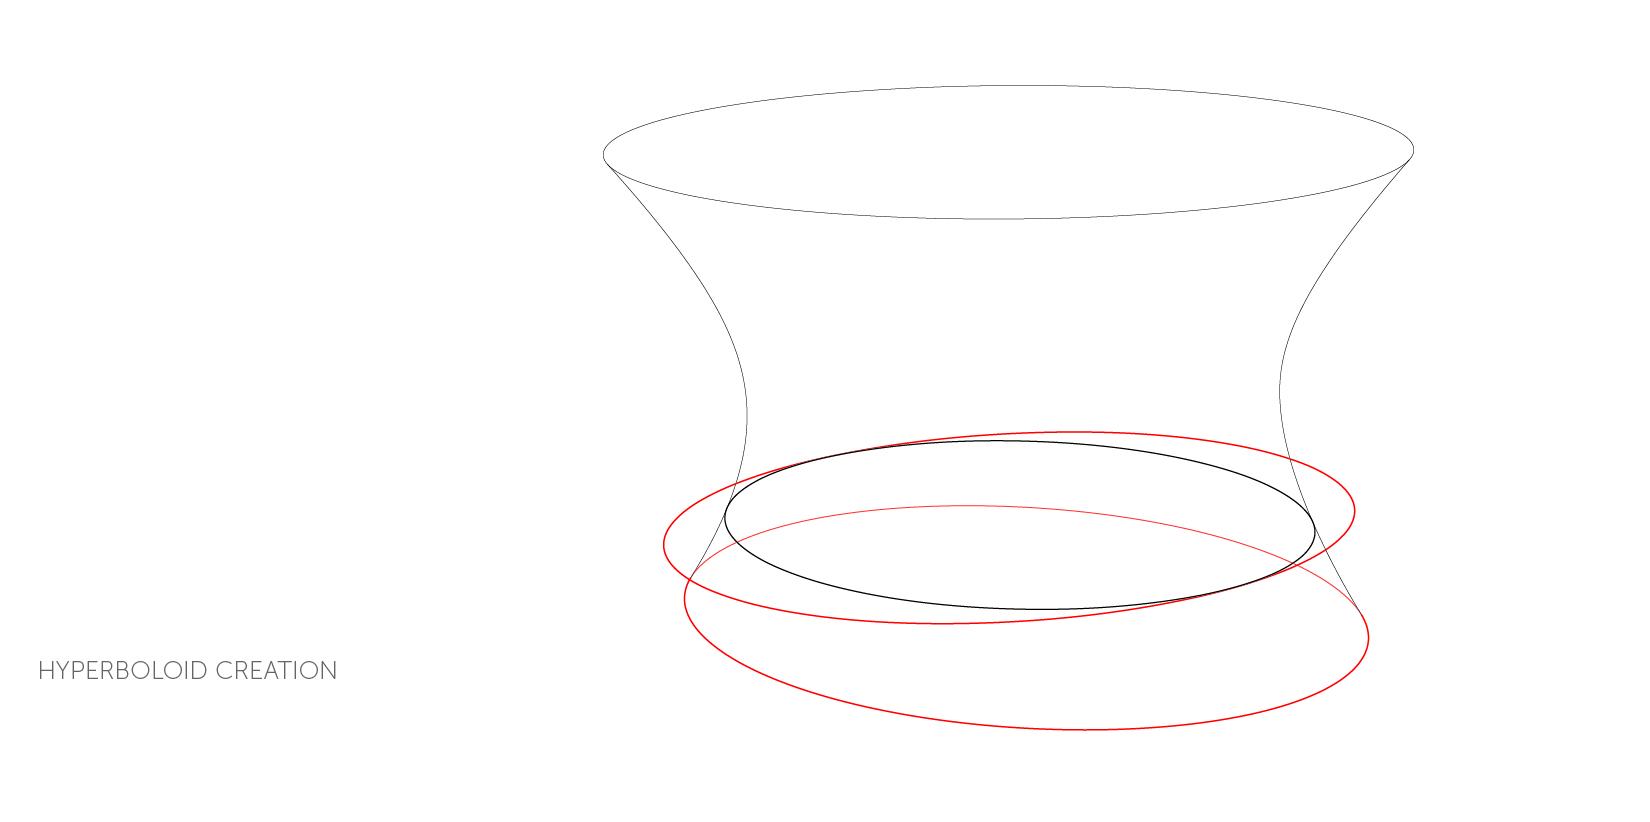 Hyperboloid Diagram_JS-12.jpg